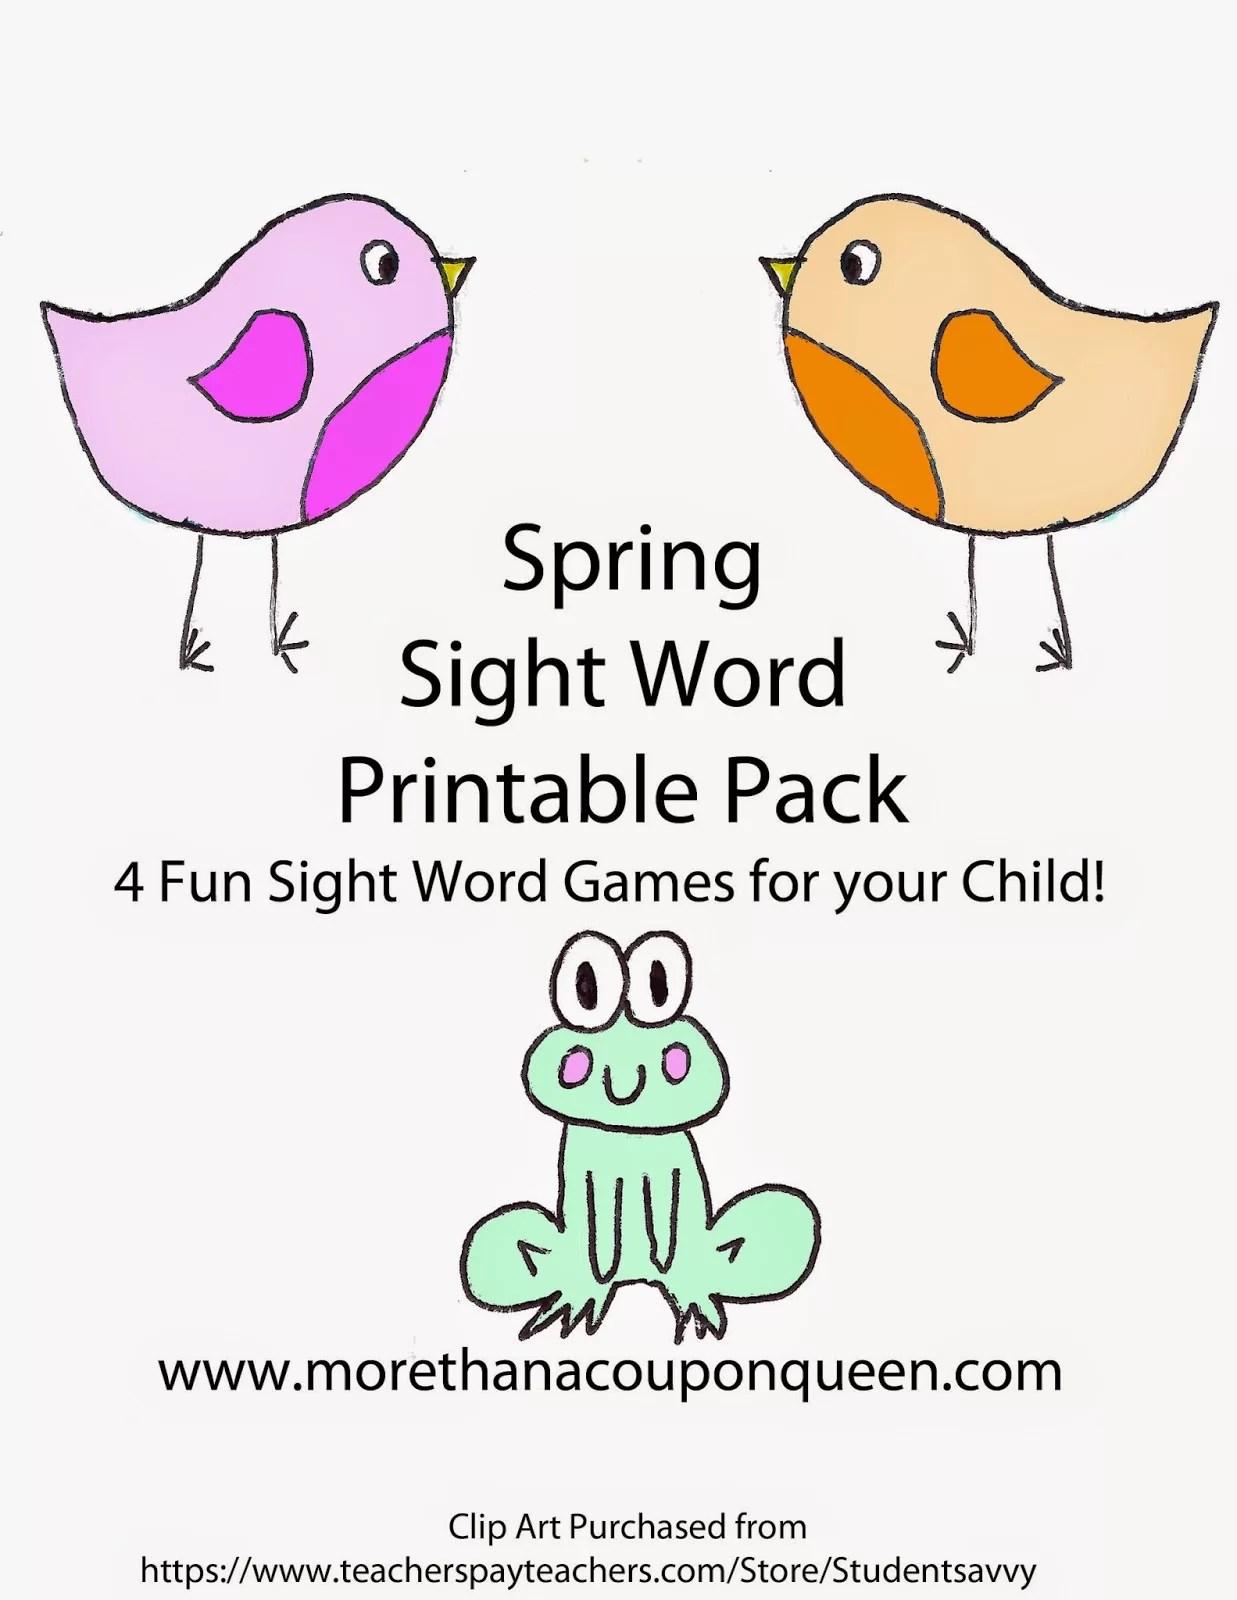 Spring Sight Word Printable Pack